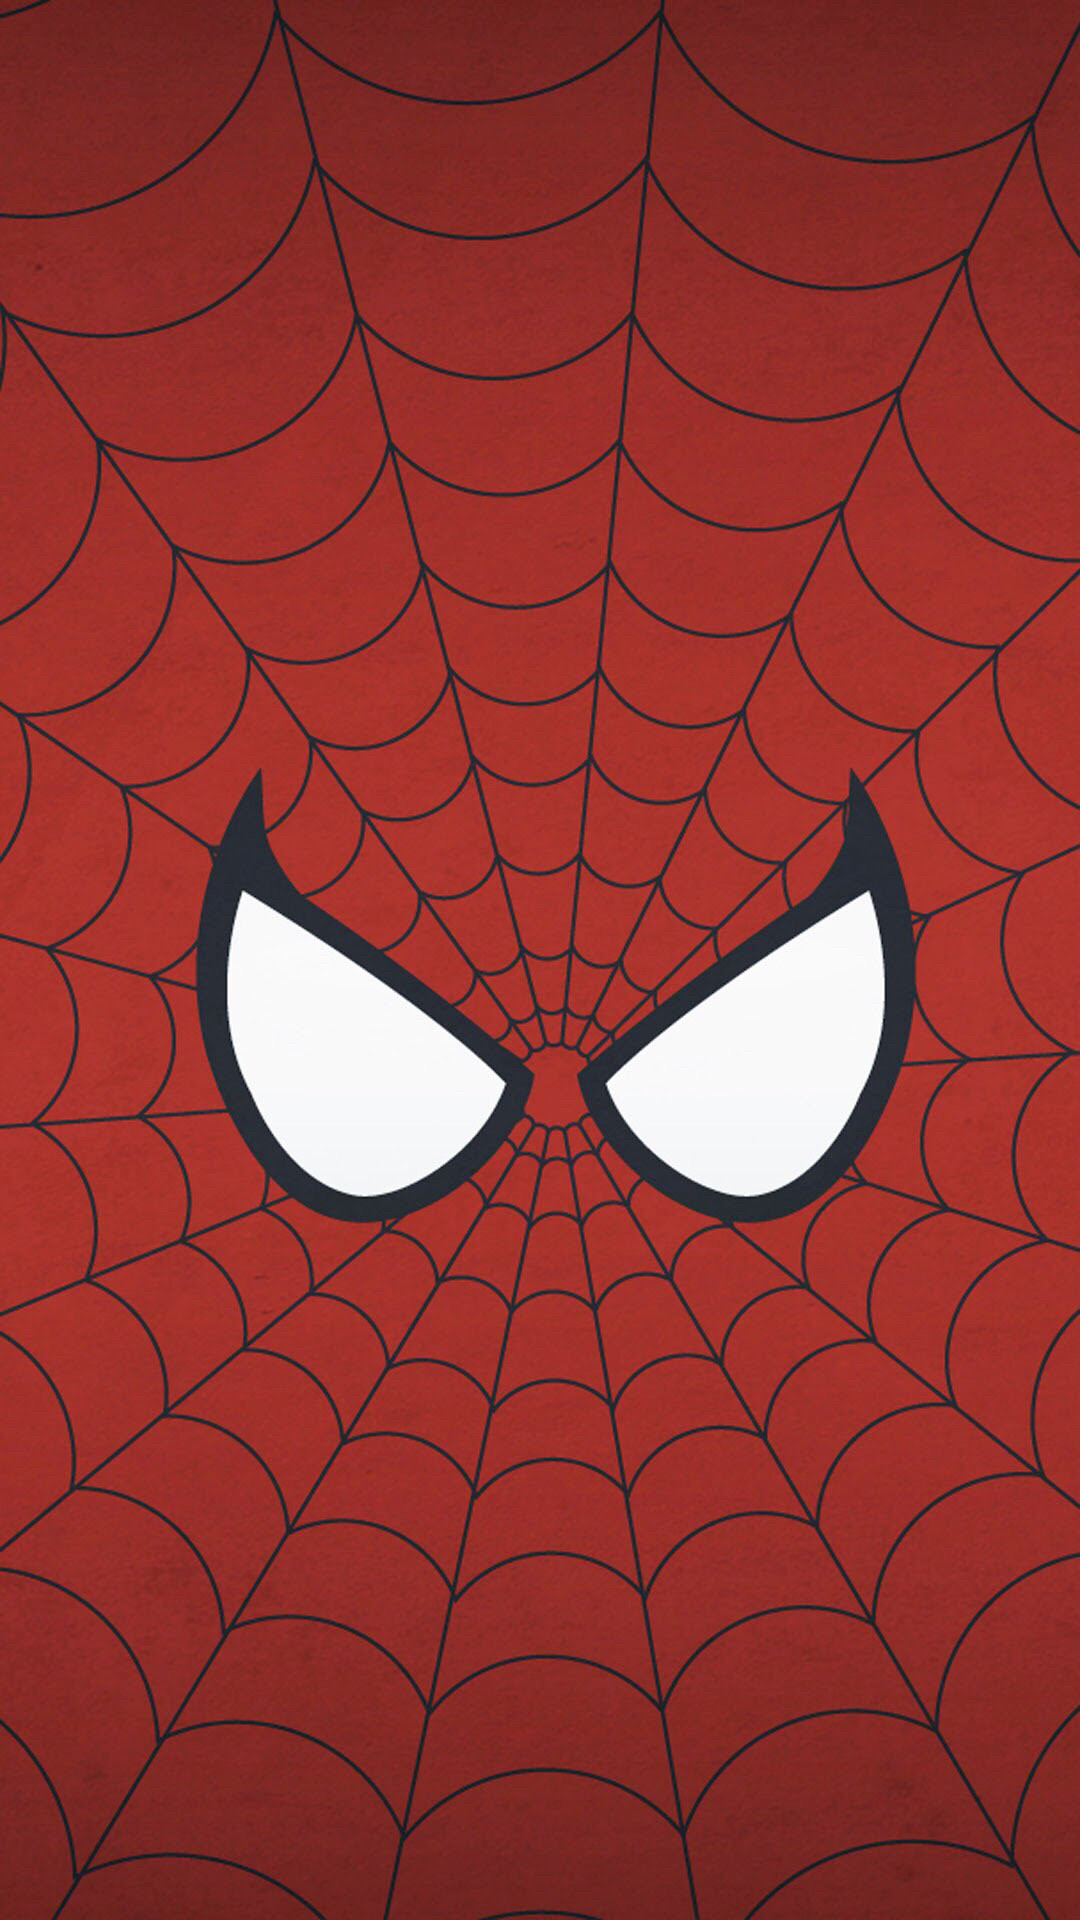 Best 25+ Spiderman wallpapers ideas on Pinterest   El hombre araña 2017,  Spiderman and Trajes de spiderman